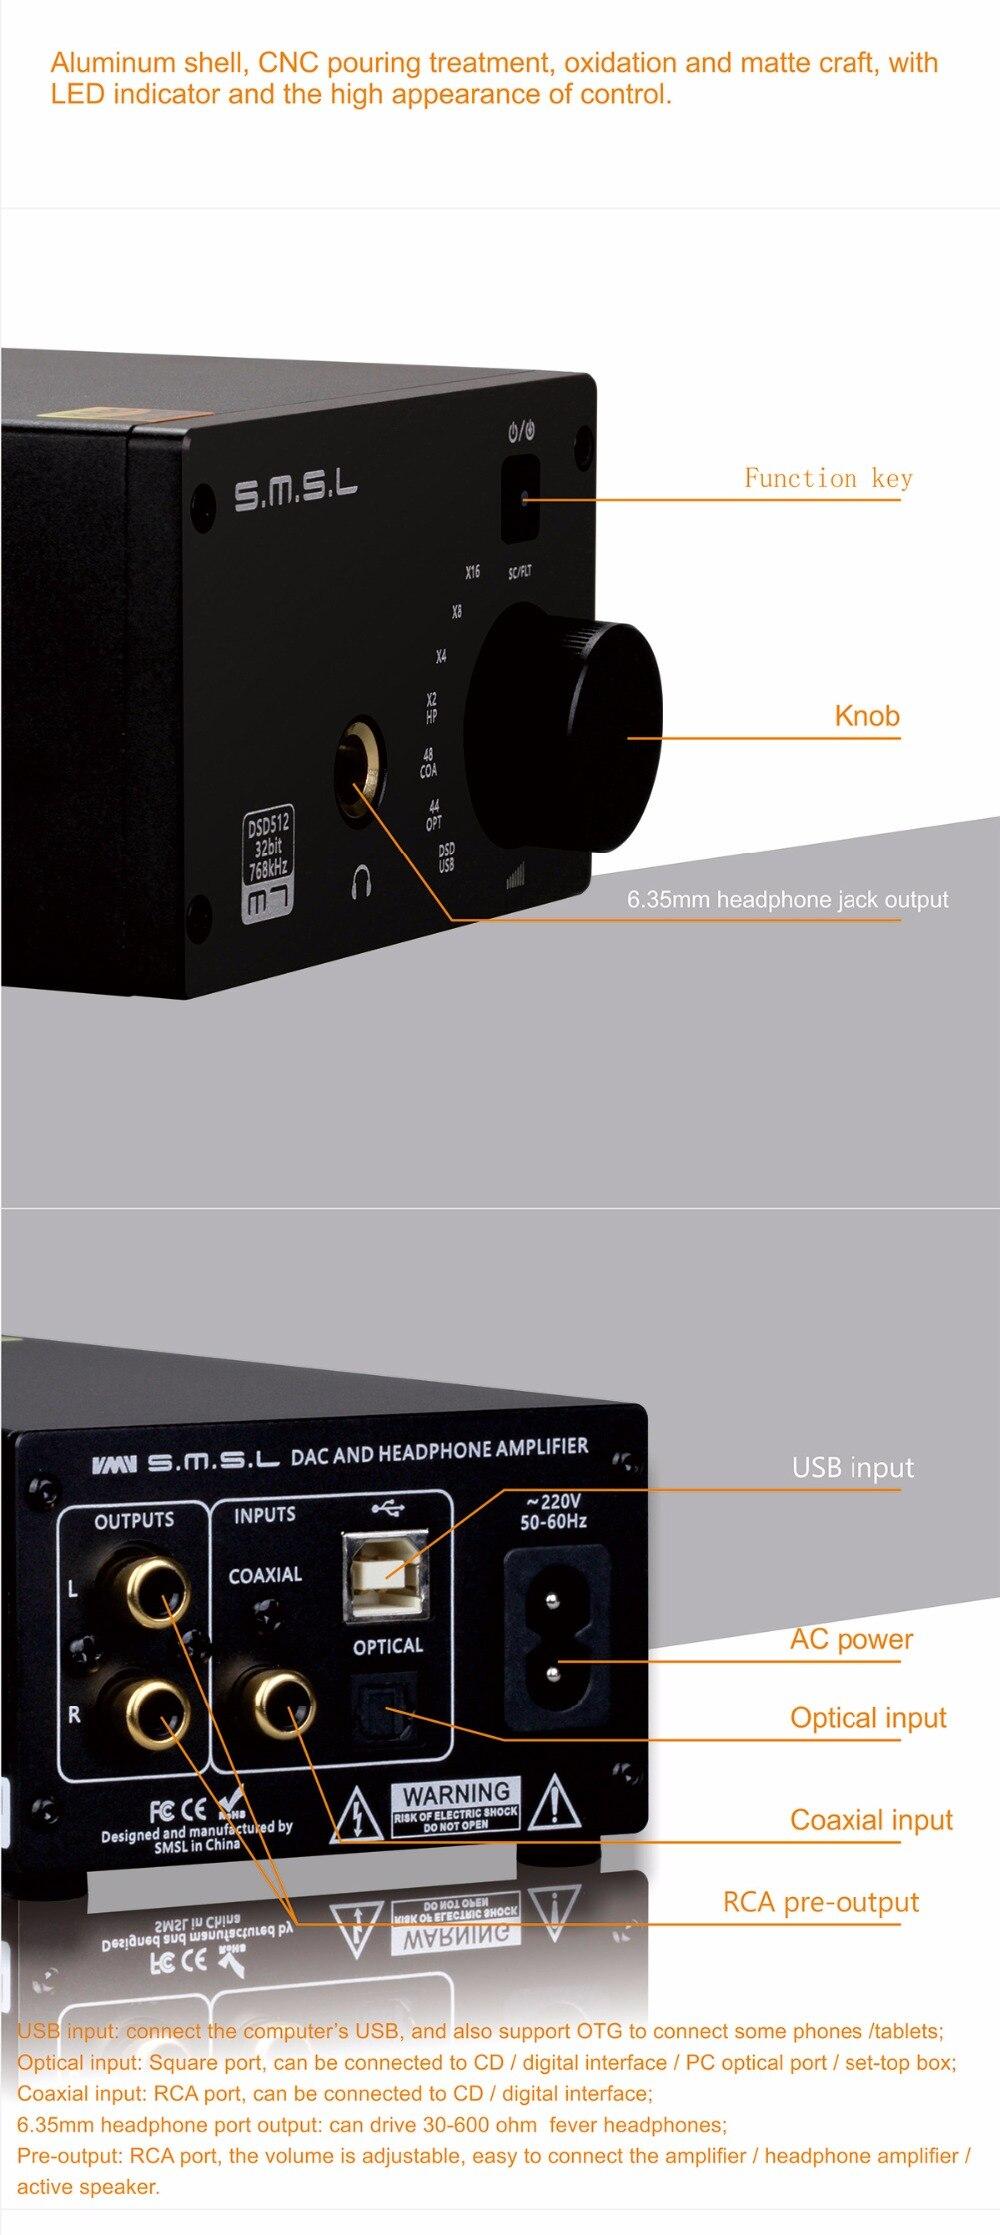 SMSL M7 2xAK4452 32Bit/768KHz DSD512 Hi-Fi Audio USB DAC with Headphone  Amplifier USB Coaxial Optical Input RCA 6 35 Jack Output